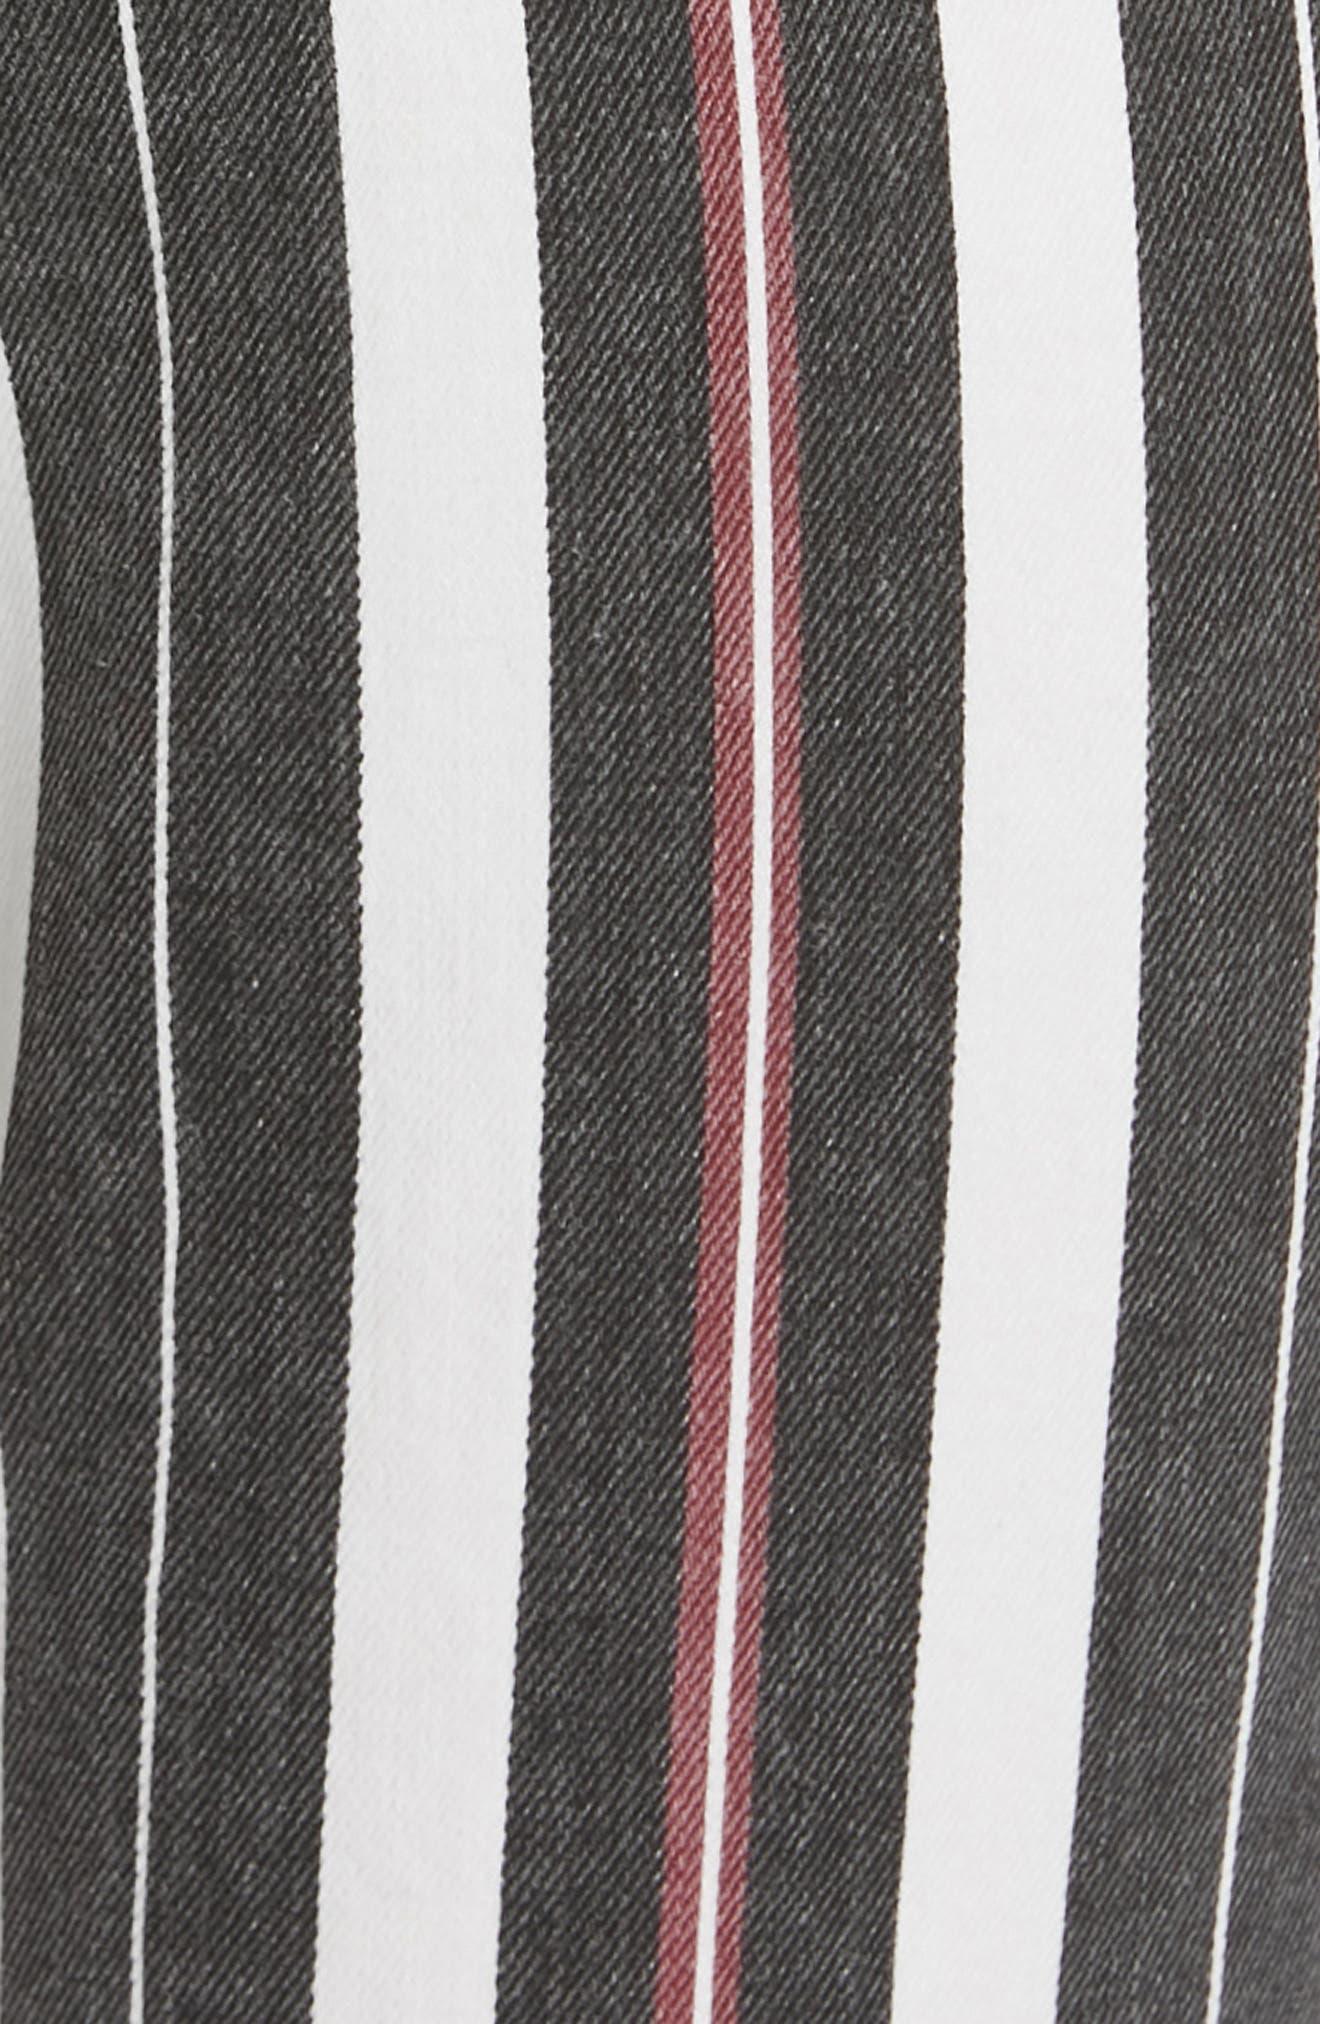 FRAME, Le Sylvie Band Stripe Straight Leg Jeans, Alternate thumbnail 5, color, BAND STRIPE